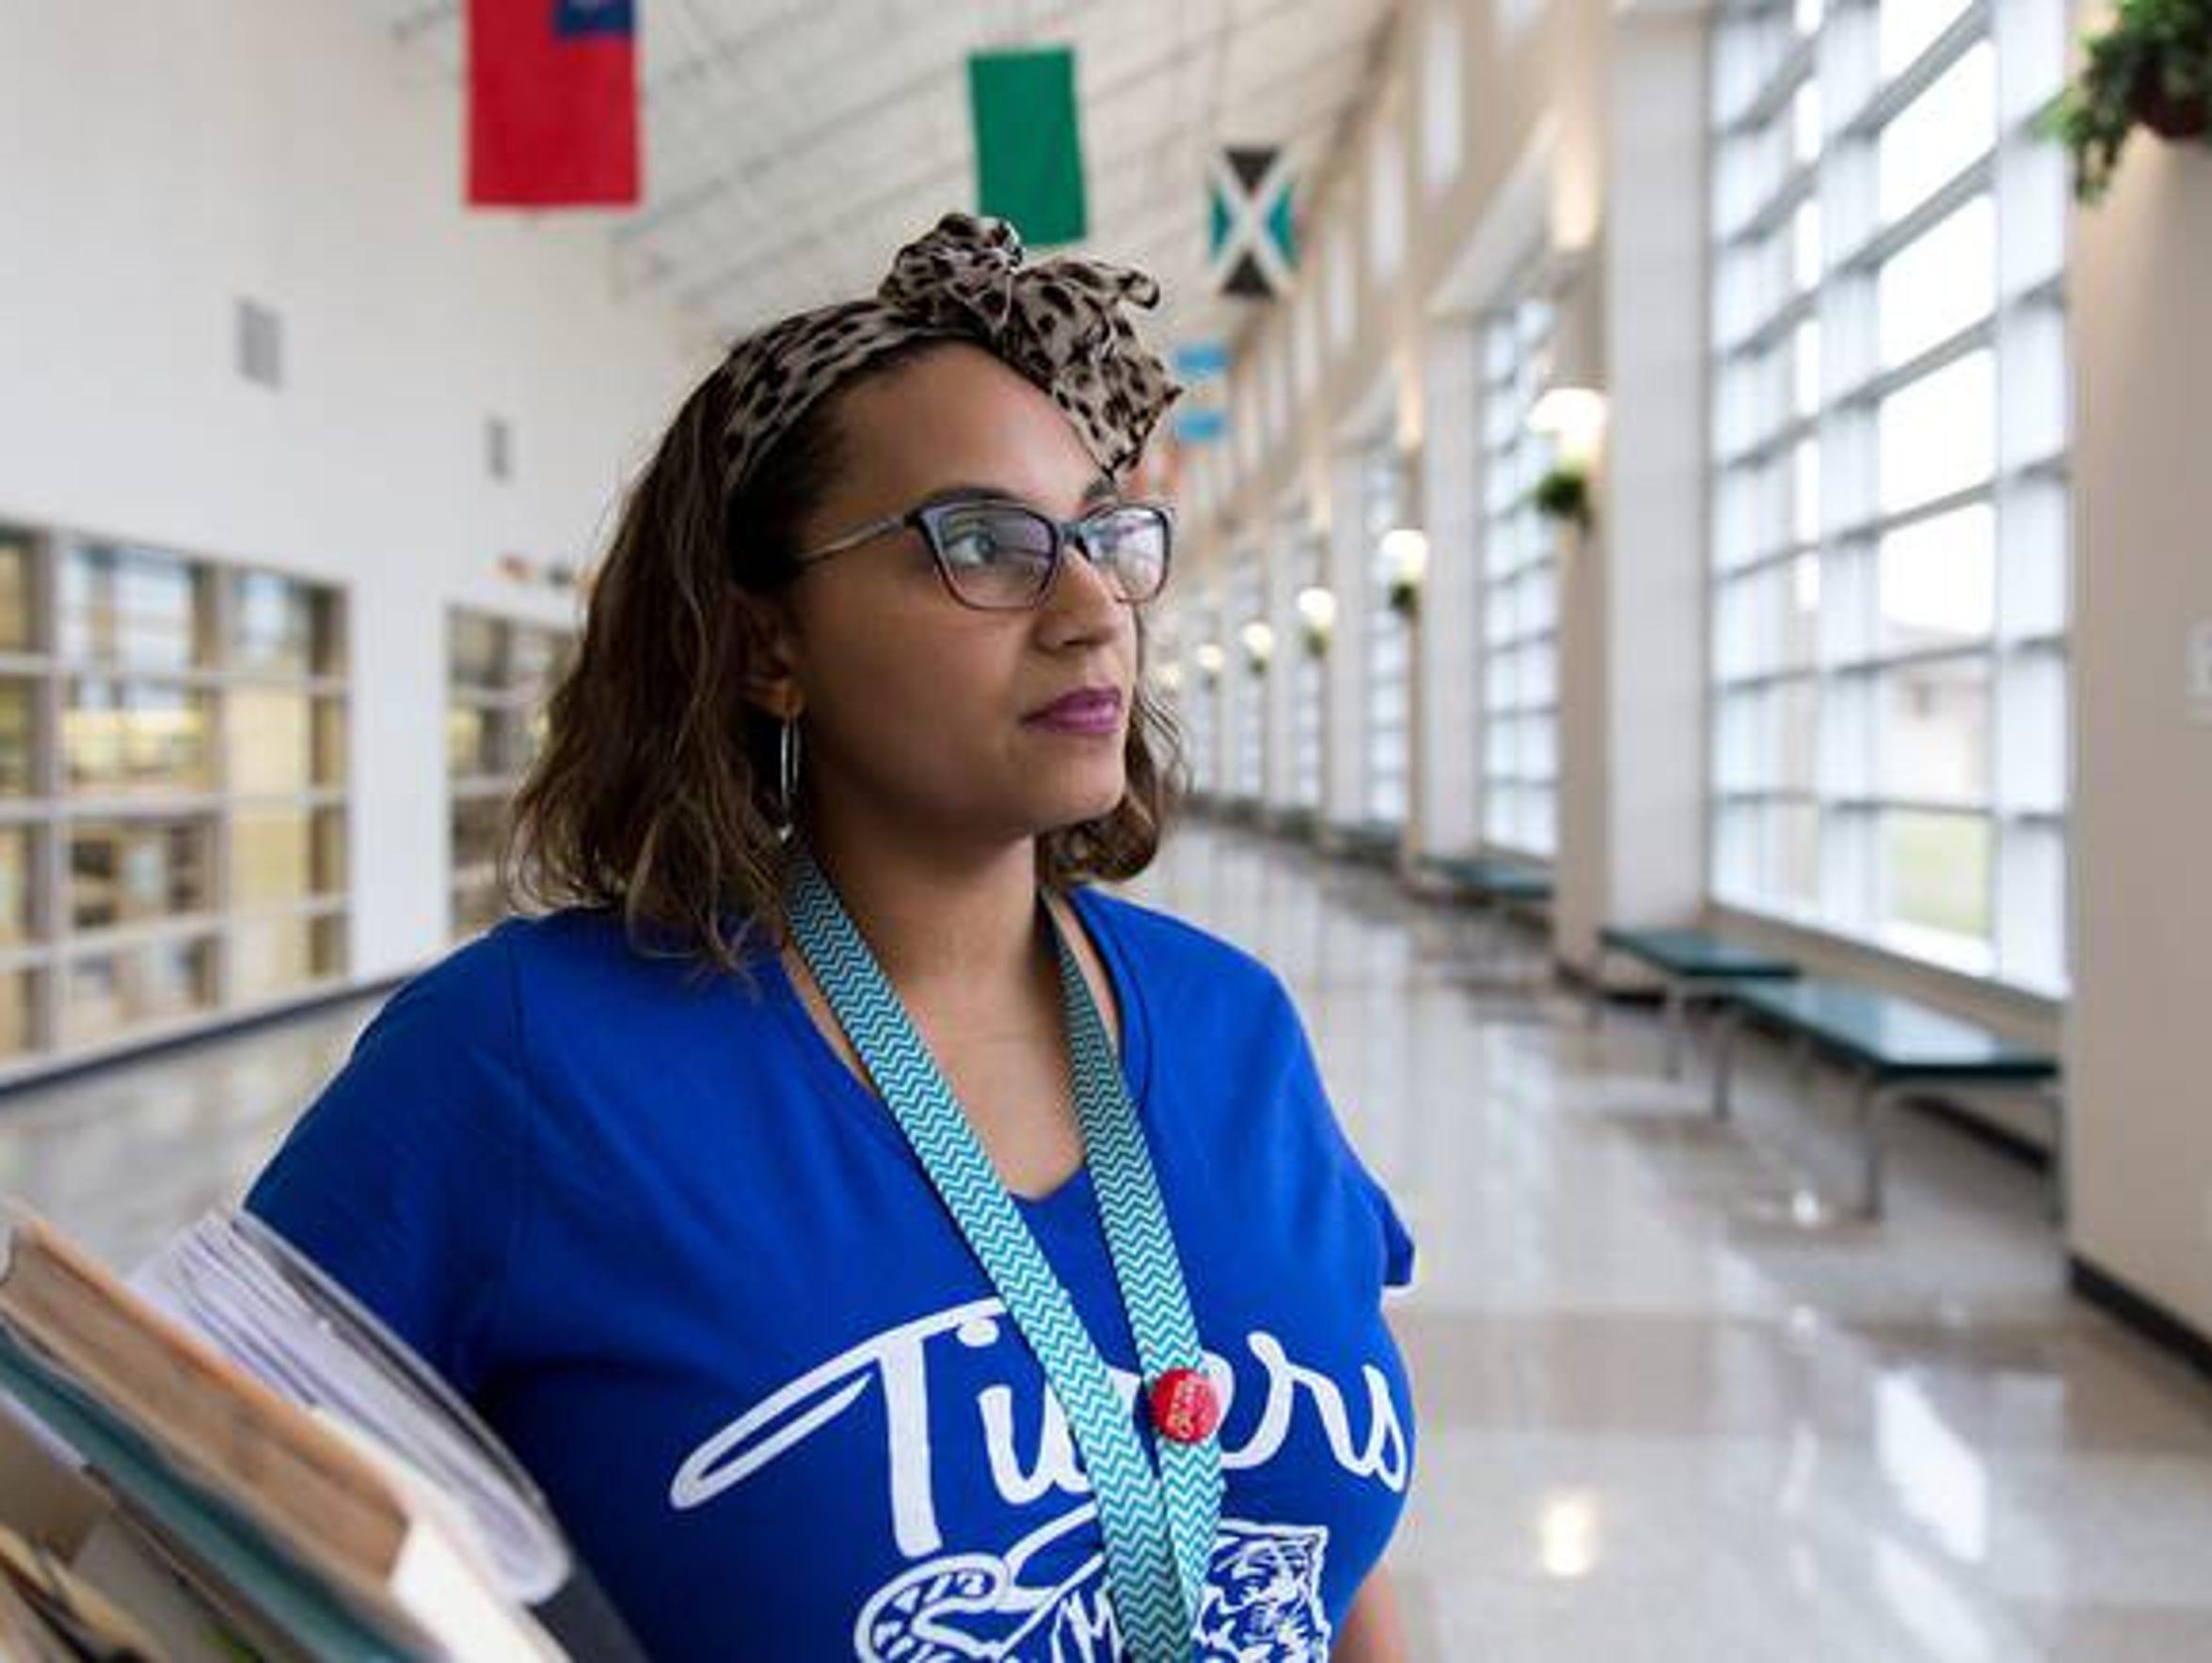 After losing 11 school days to Hurricane Harvey, Tiffany